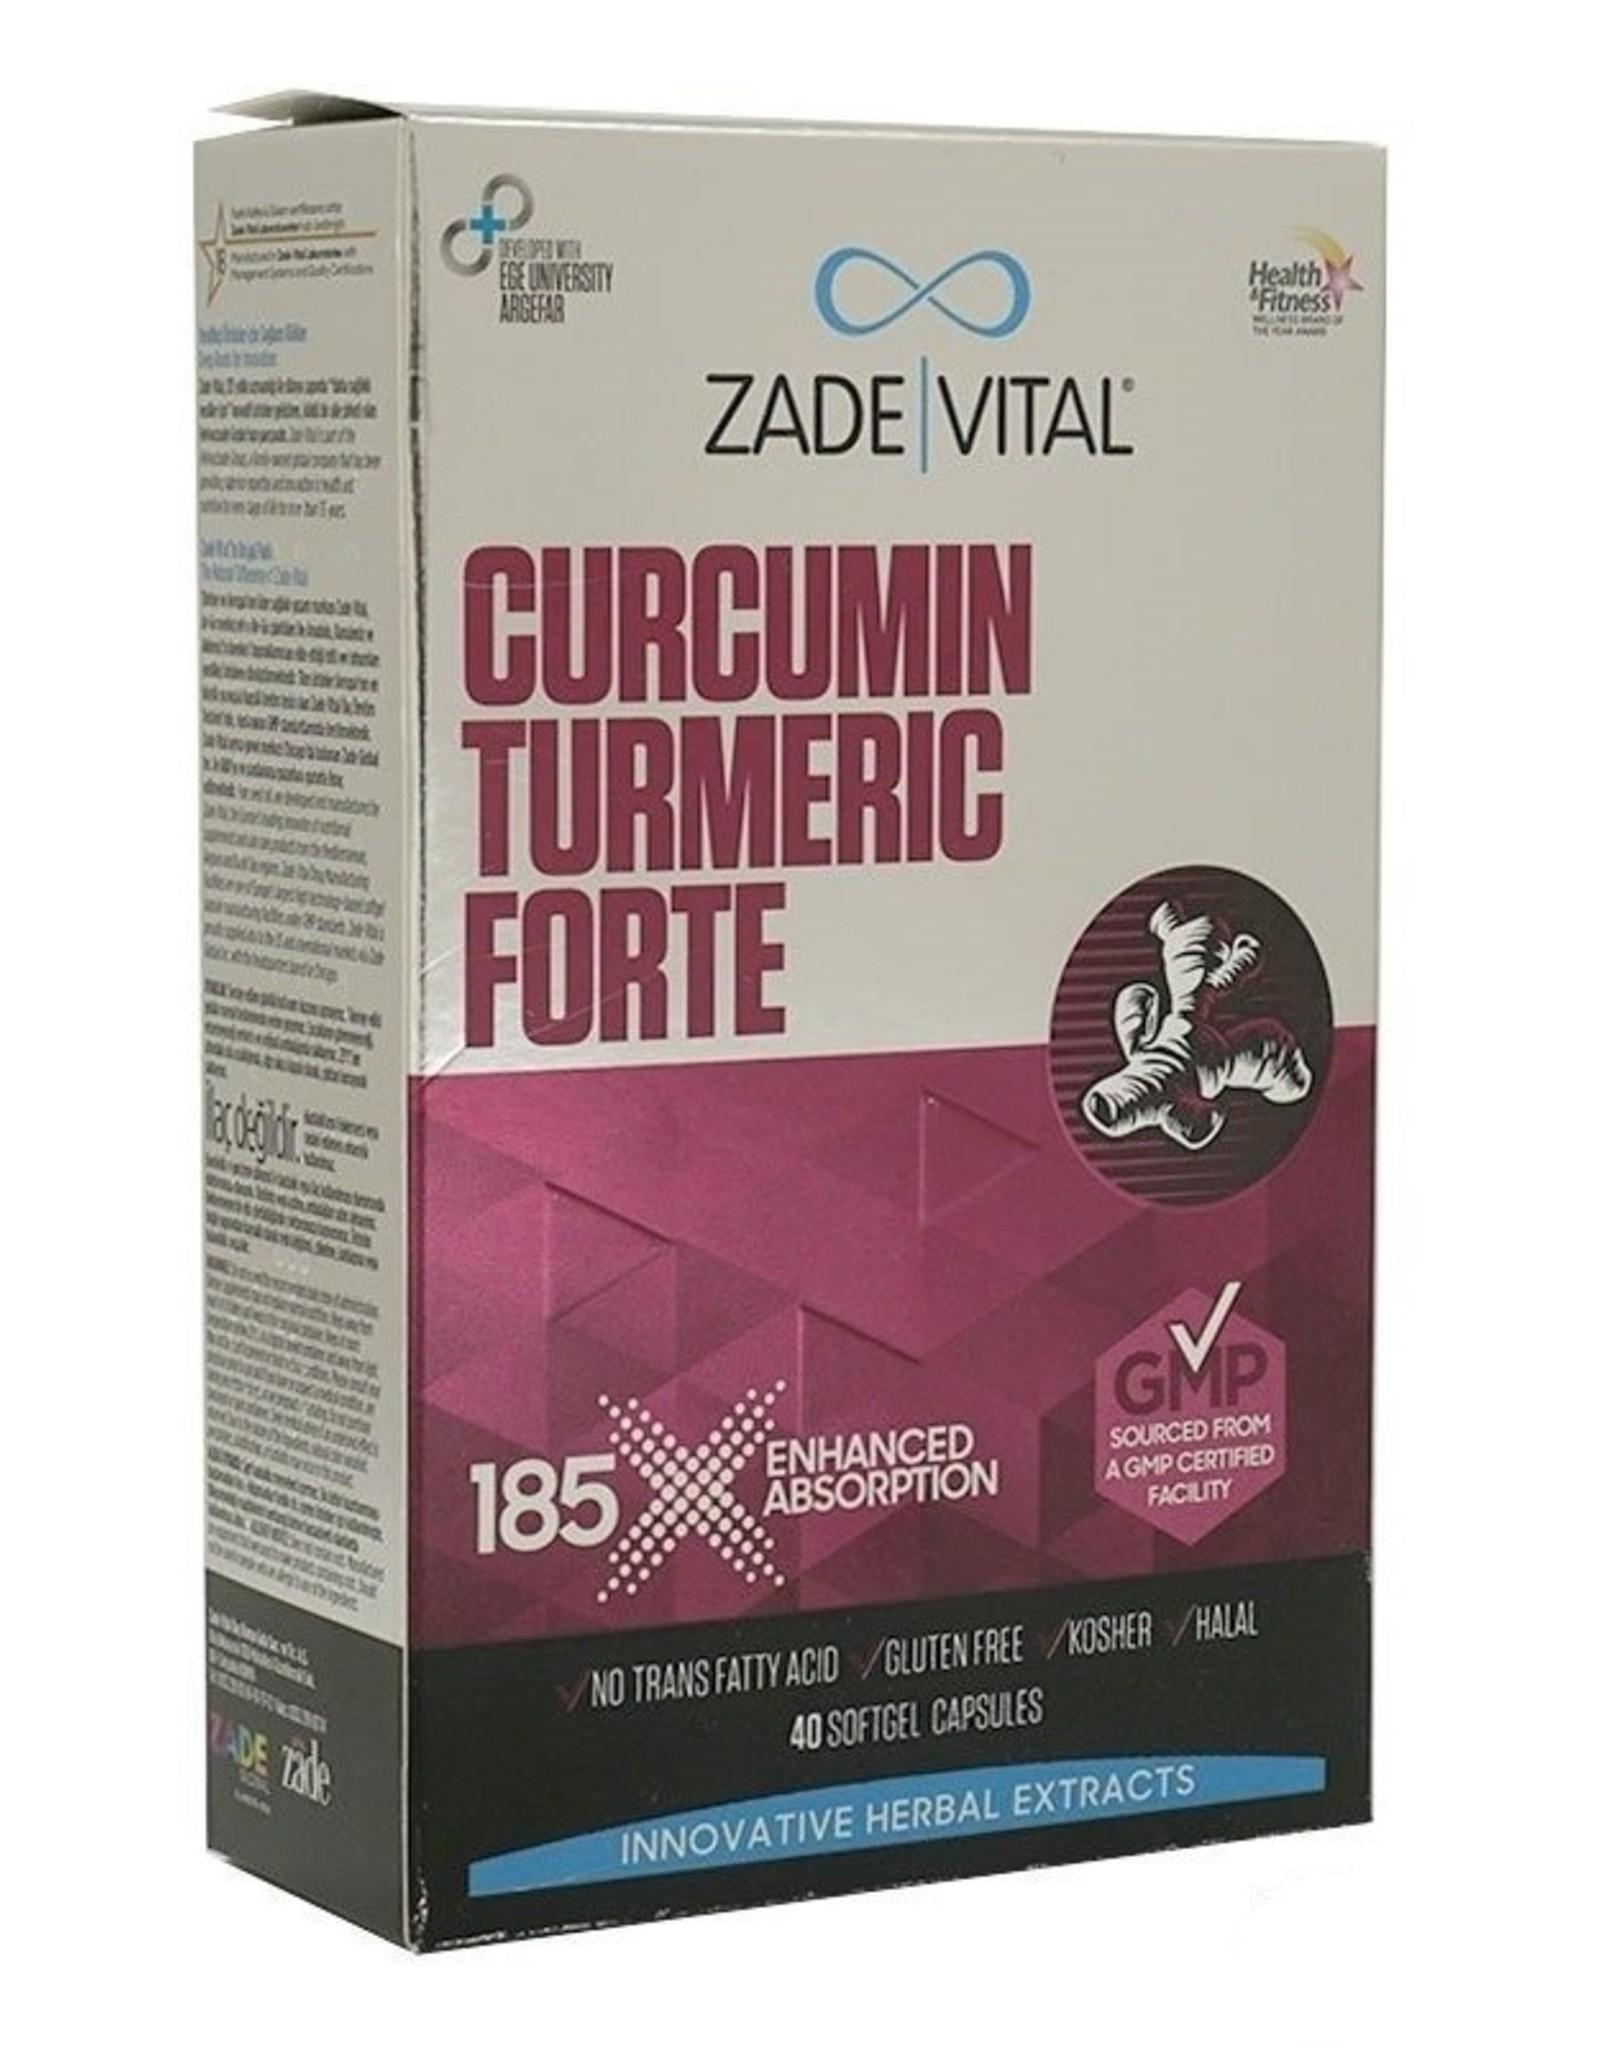 Zade Vital Zade Vital Curcumin Turmeric Forte 1000 Mg- 40 Softgel Capsules